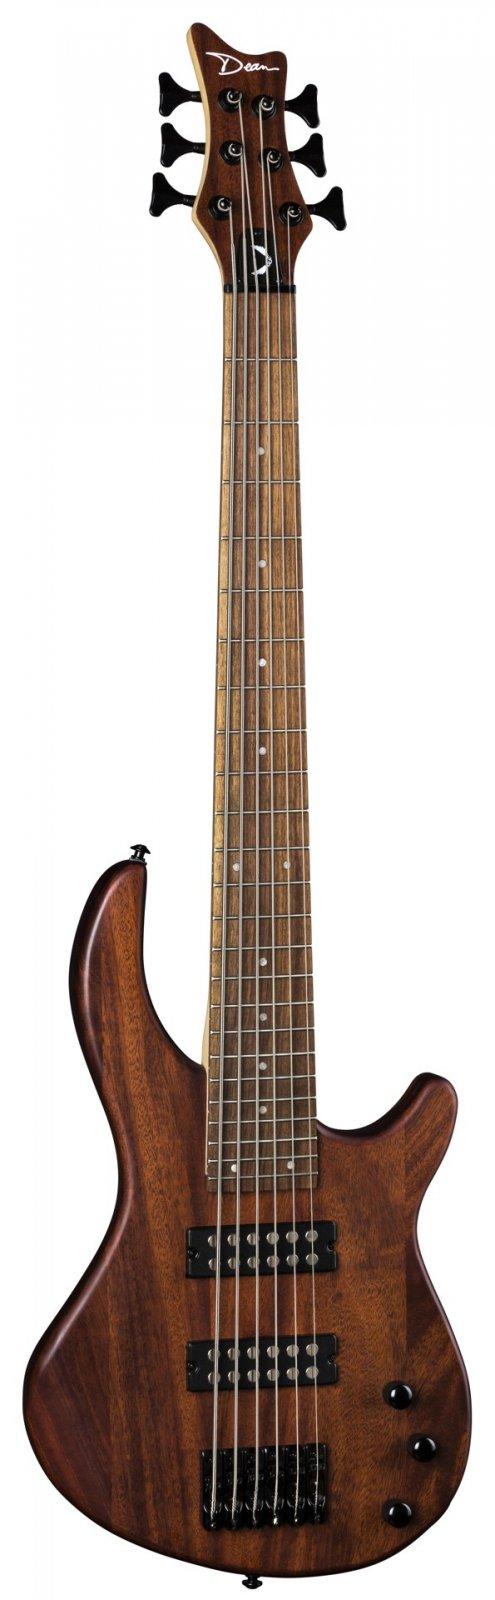 Dean E1 6 VM Edge 1 6-String Vintage Mahogany Bass